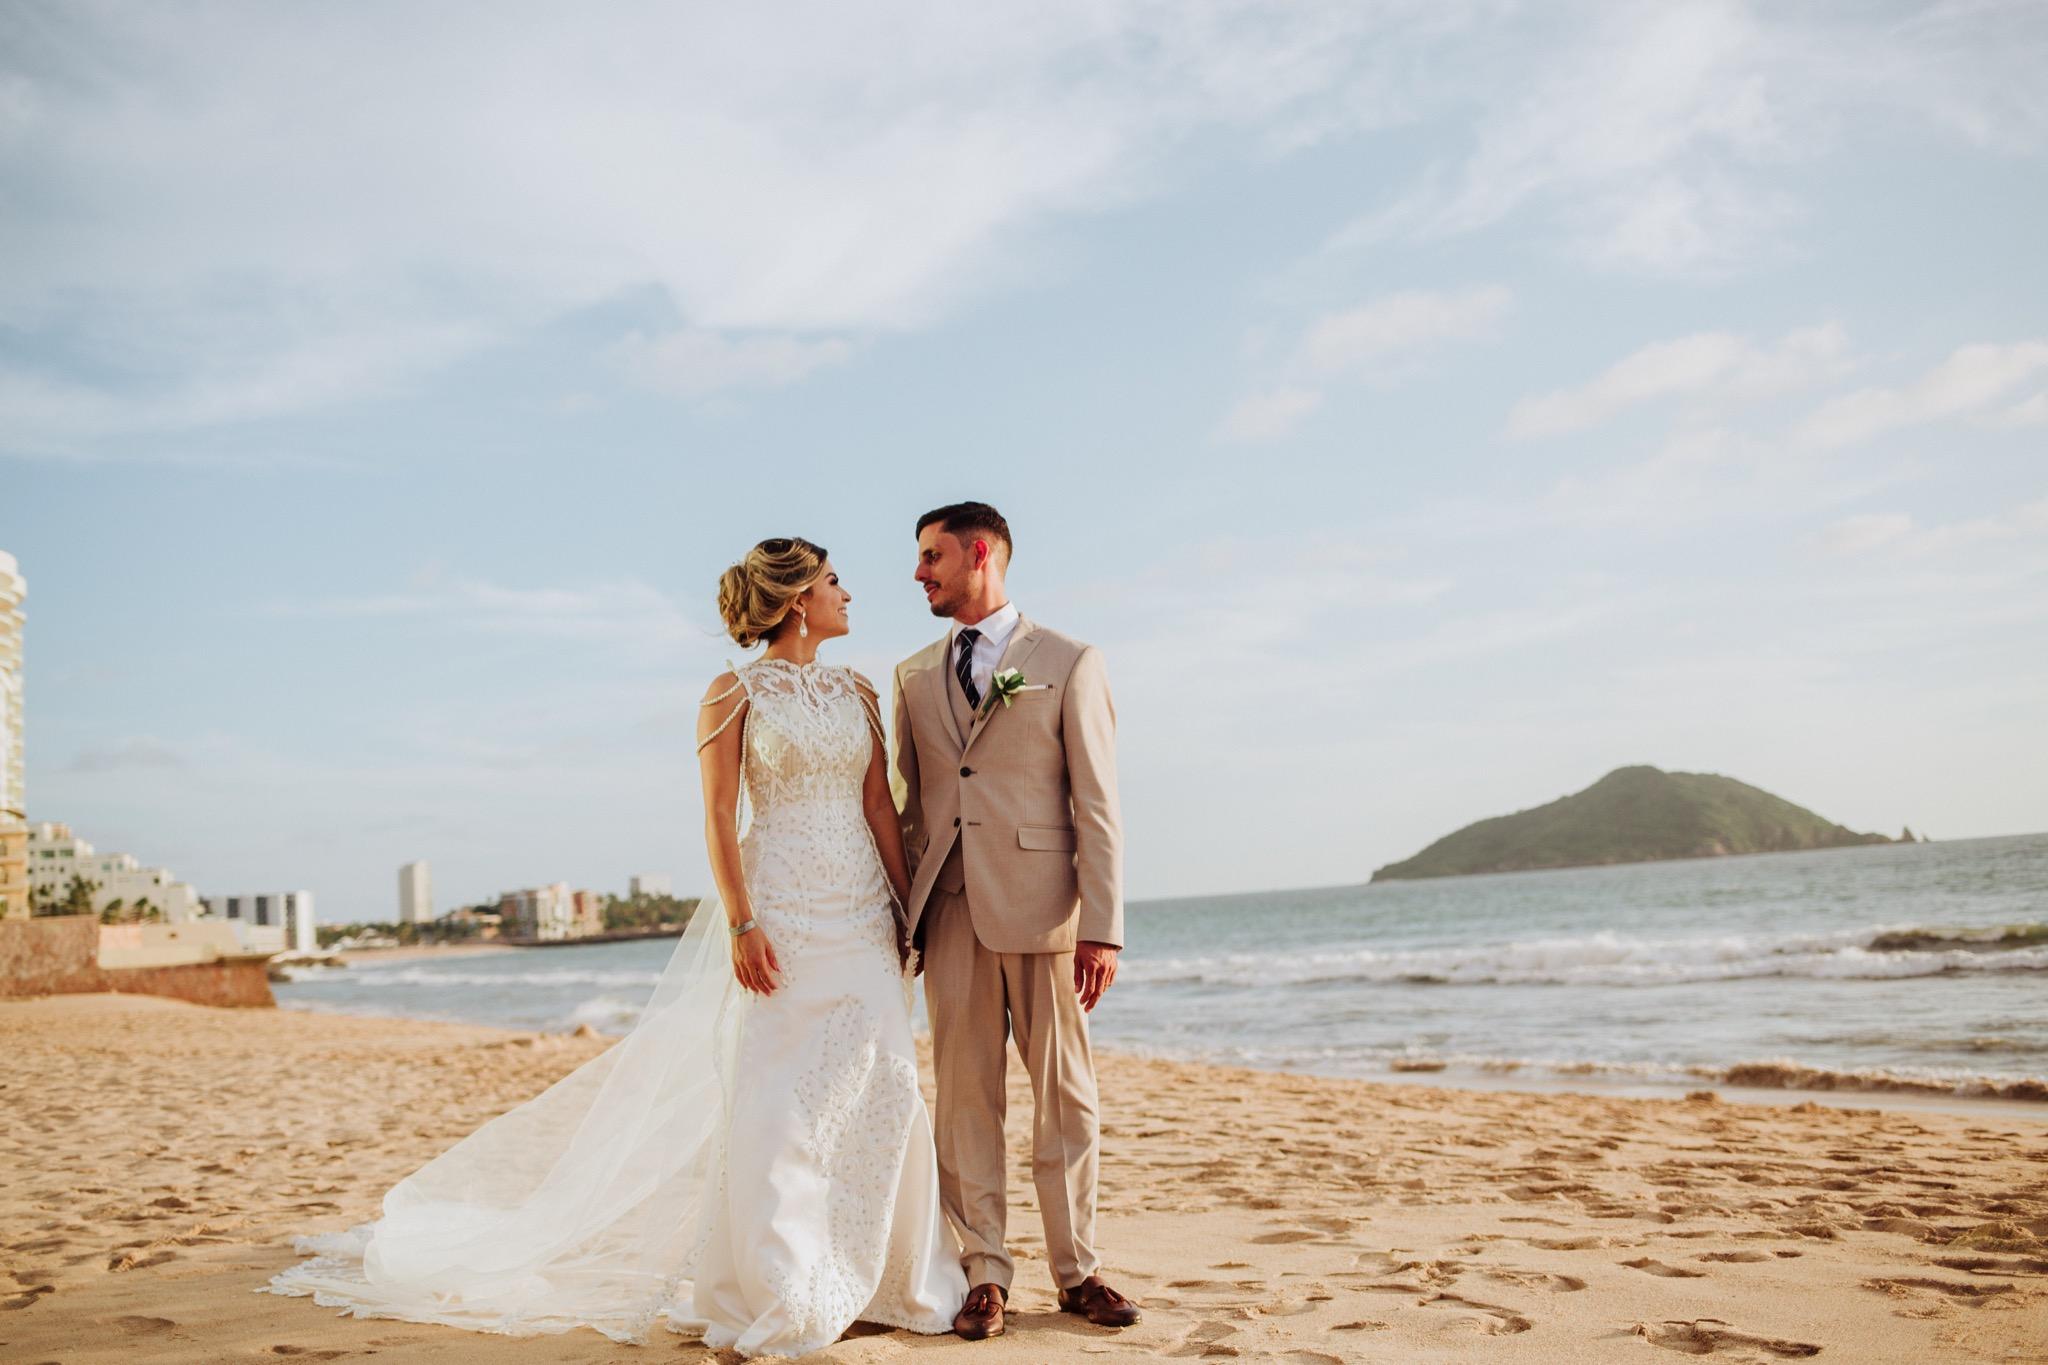 Javier_noriega_fotografo_bodas_profesional_zacatecas_mexico_mazatlan_sinaloa_photographer_weddings43